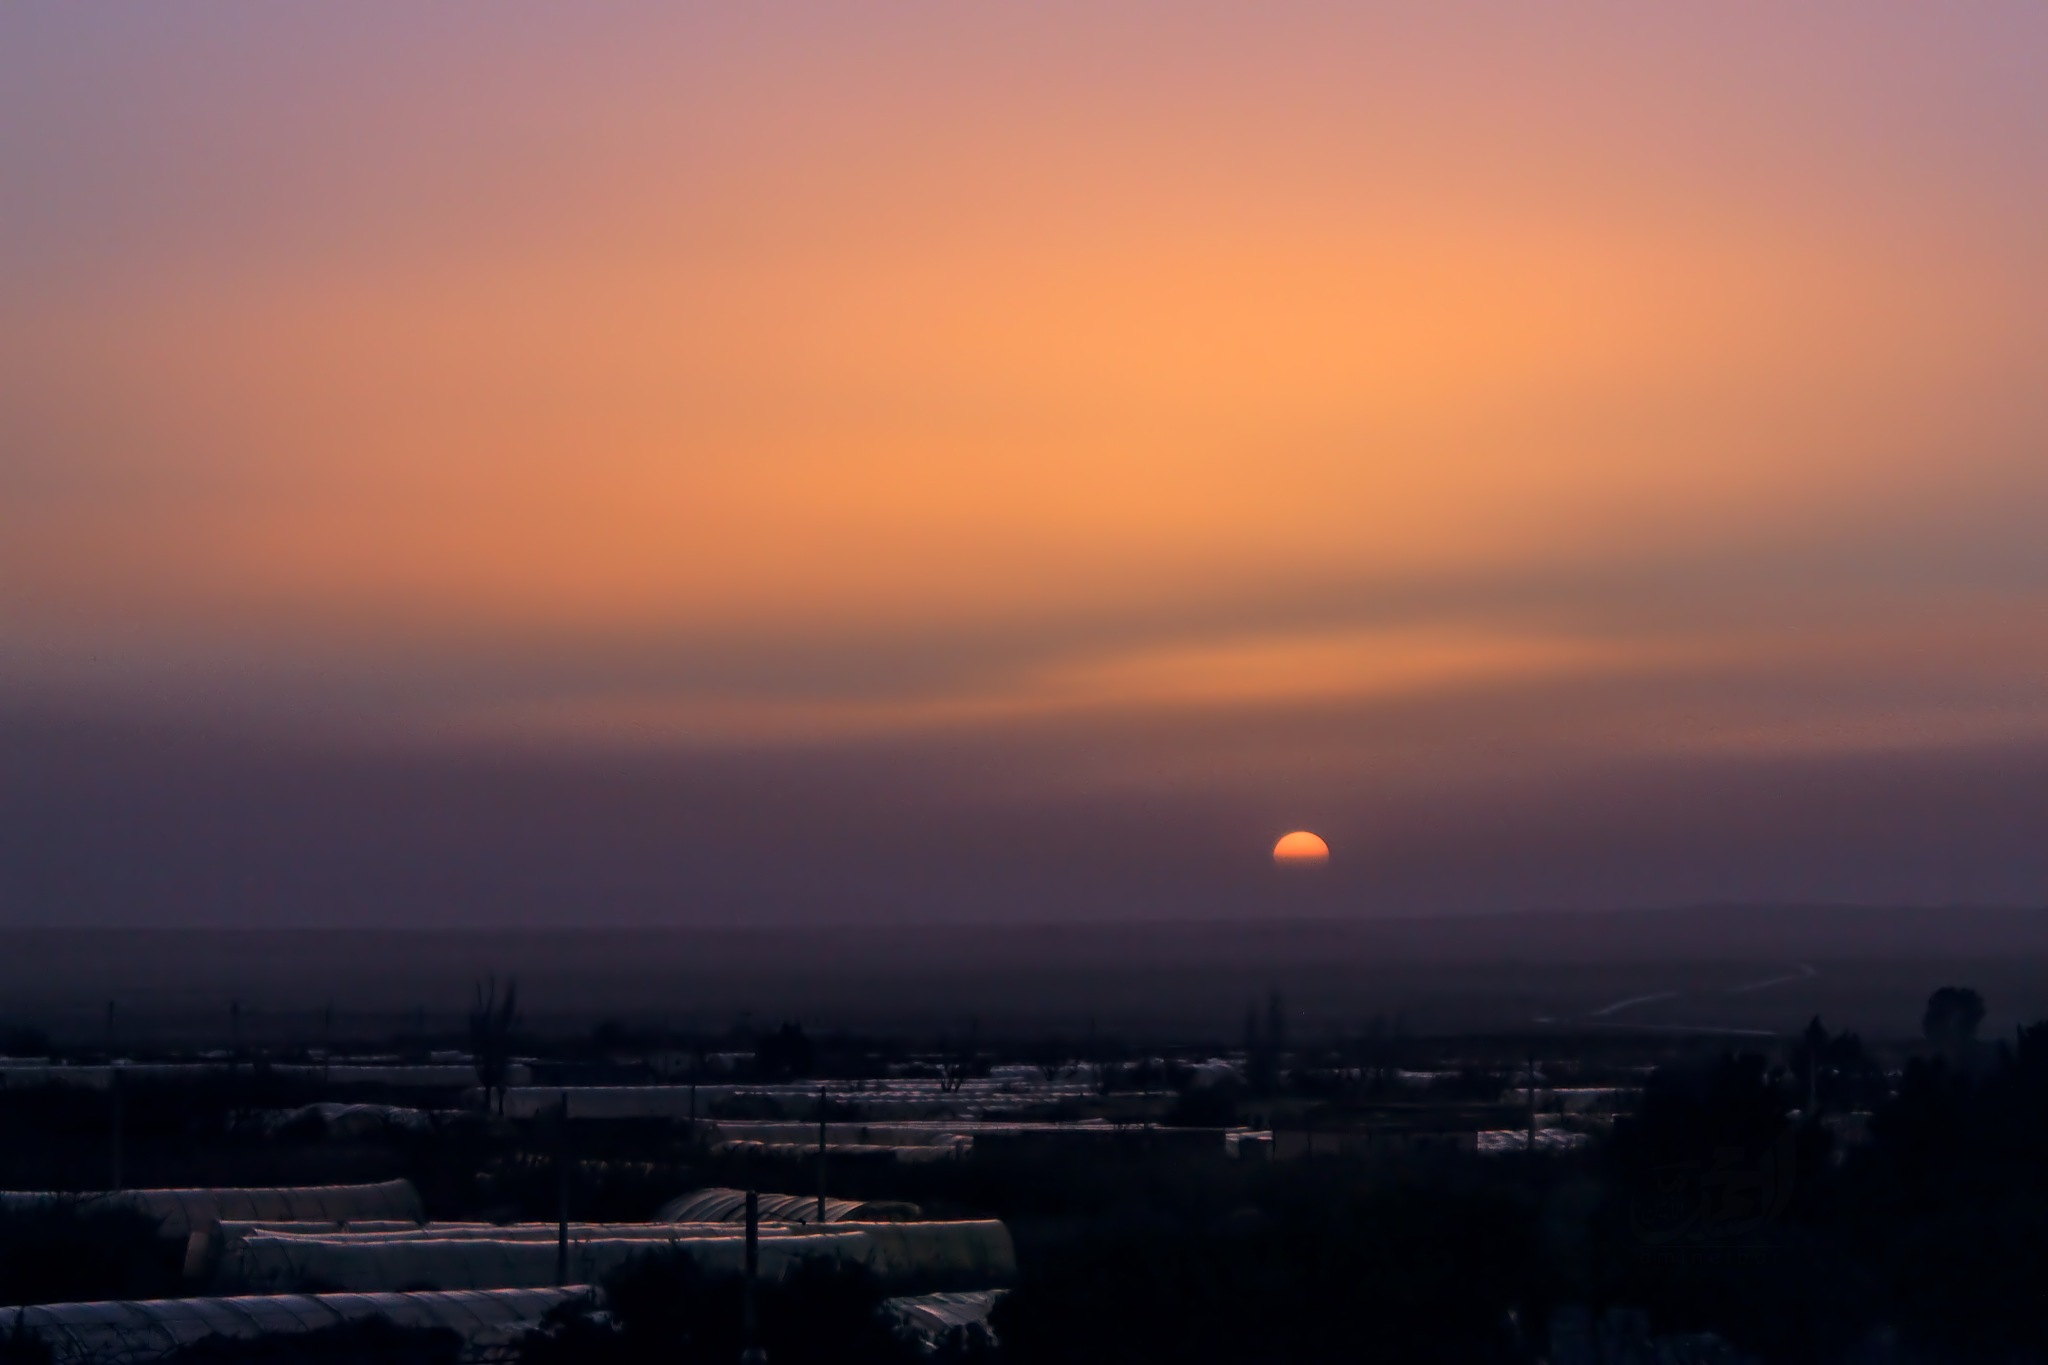 Sun down by MOHAMED ELAMIN EL BAR